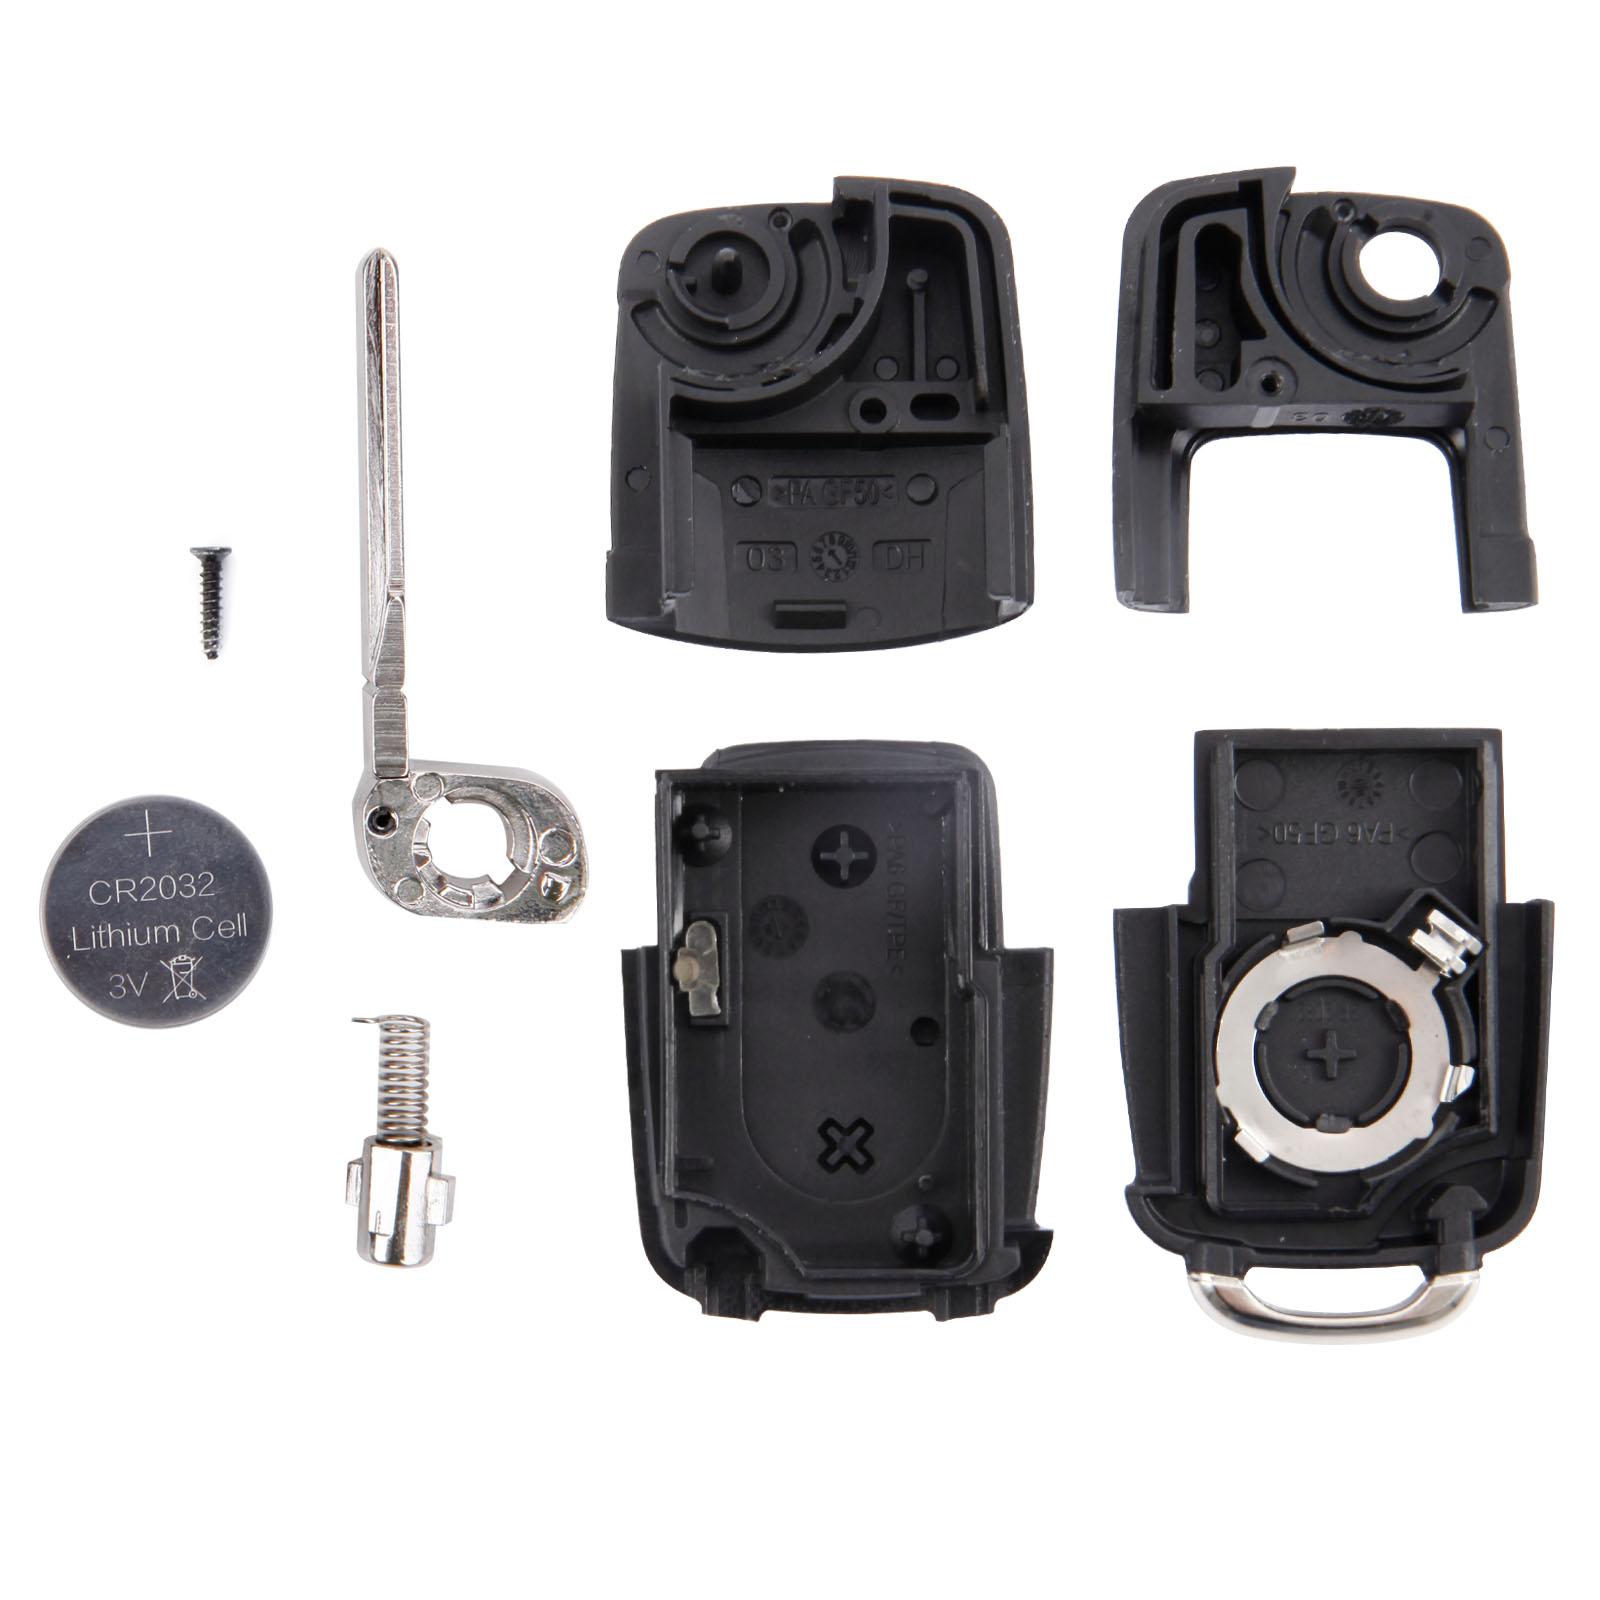 FOR VW Golf Bora Polo Passat Replace 2-Button Flip Key Fob